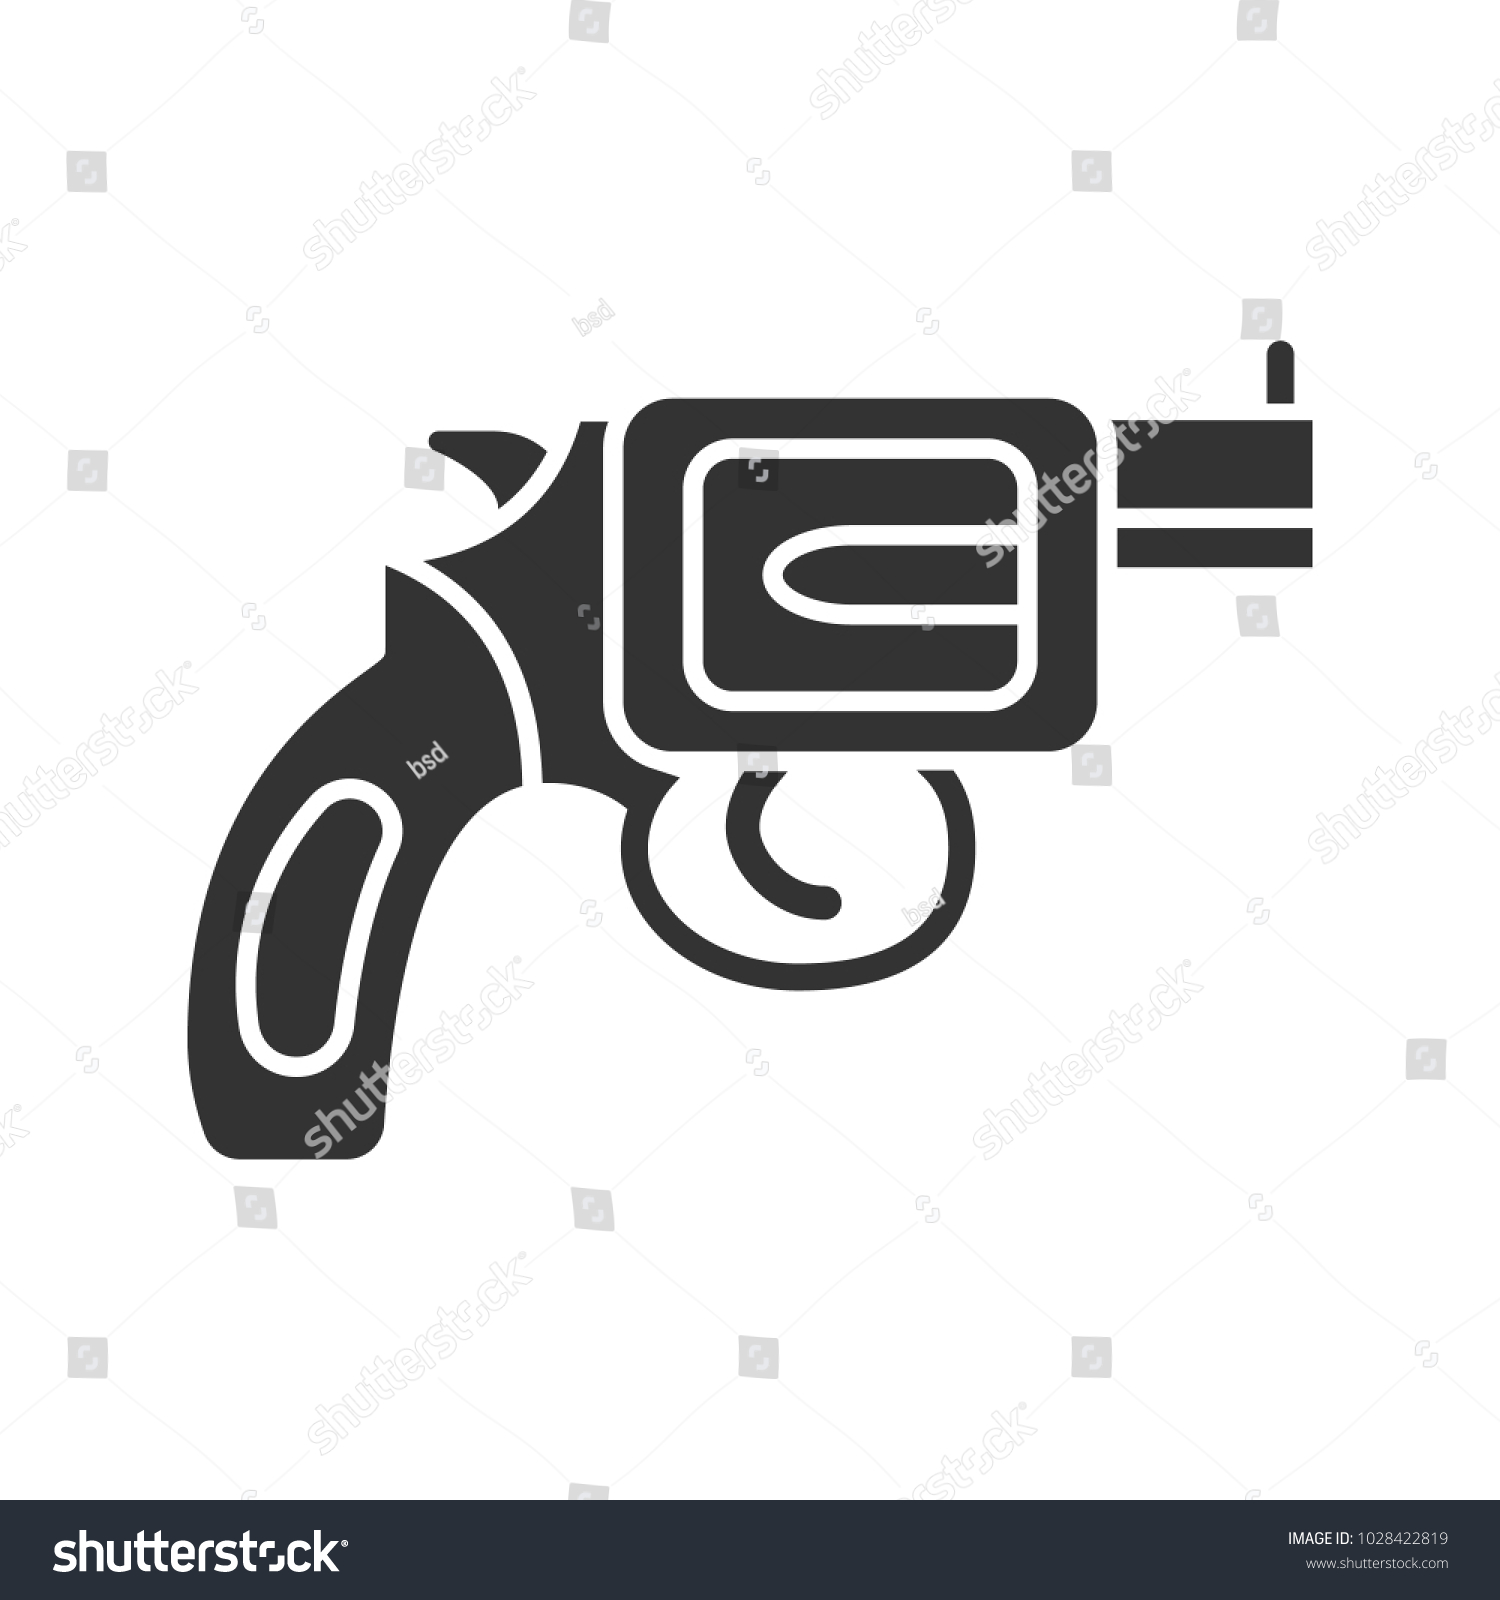 Pistol text symbol gallery symbol and sign ideas pistol text symbol choice image symbol and sign ideas revolver glyph icon pistol gun silhouette stock biocorpaavc